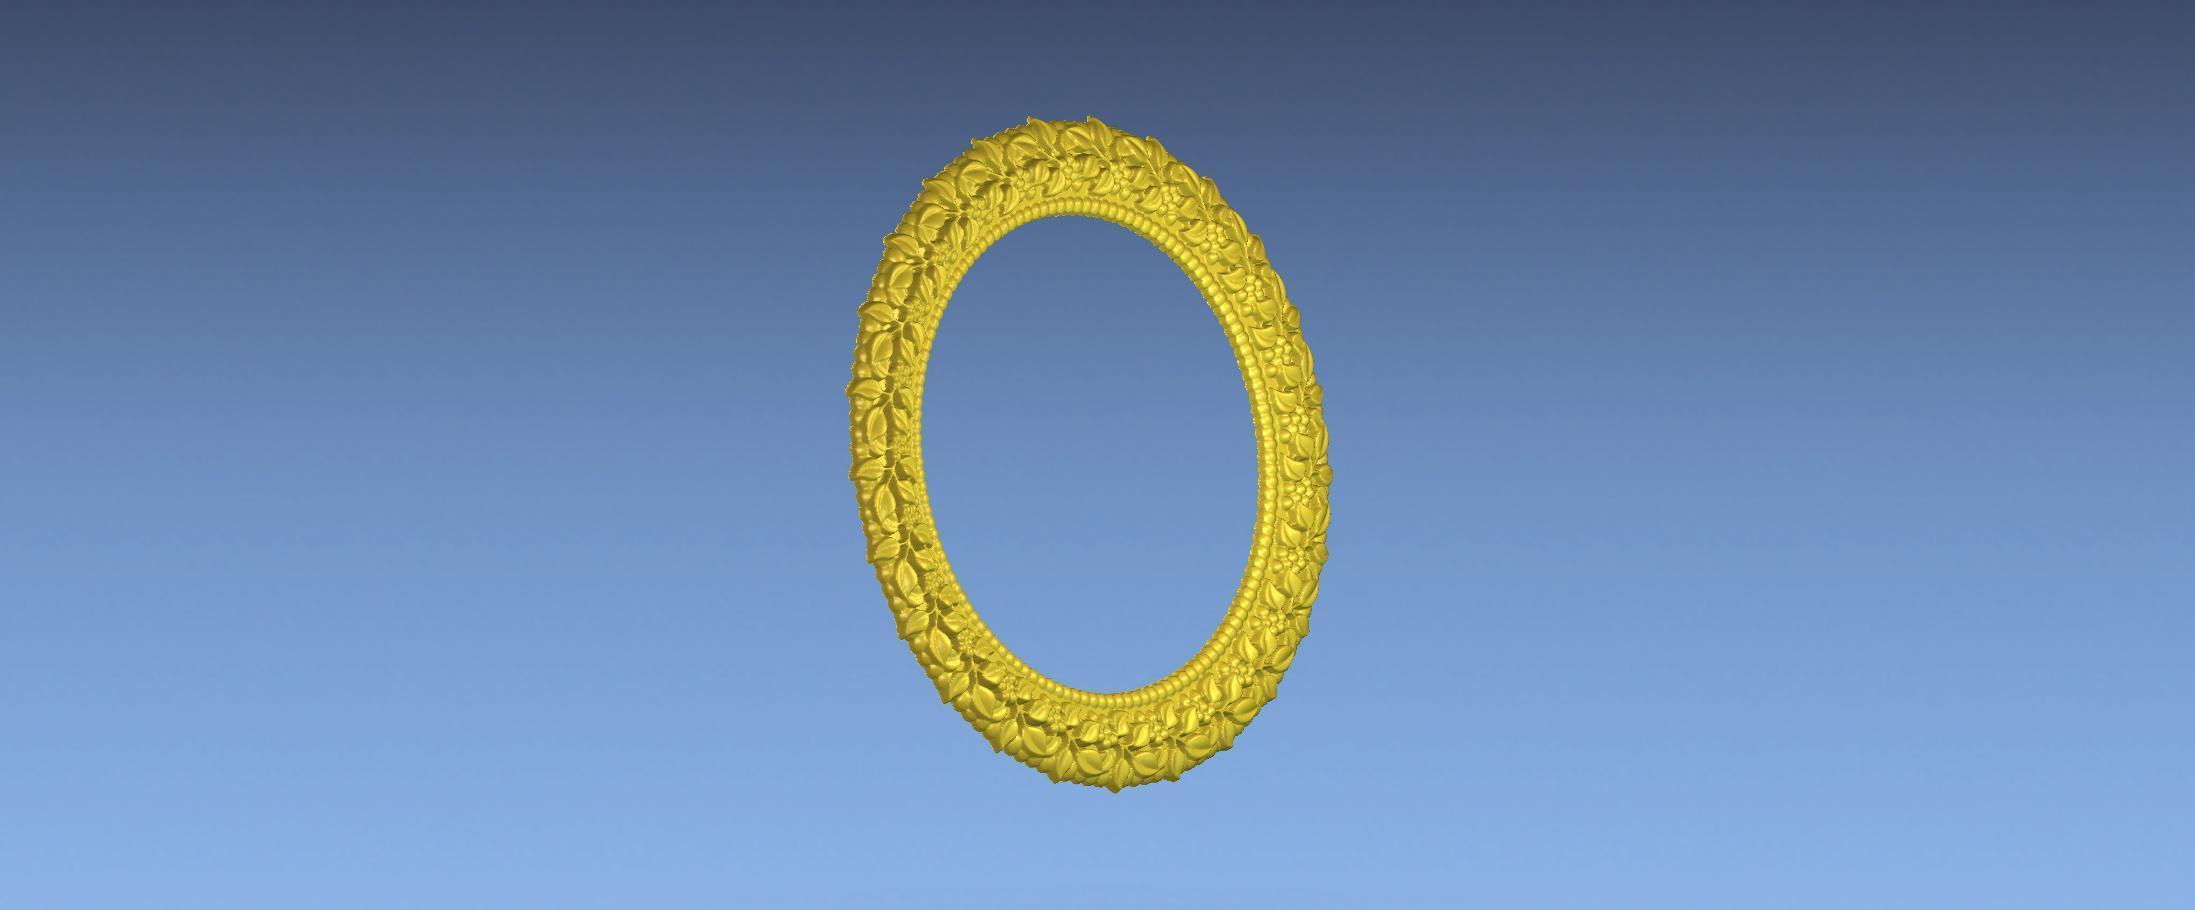 2.jpg Download free STL file ROUND BORDER 3D STL FILE • 3D printer object, ALPHA_MENA